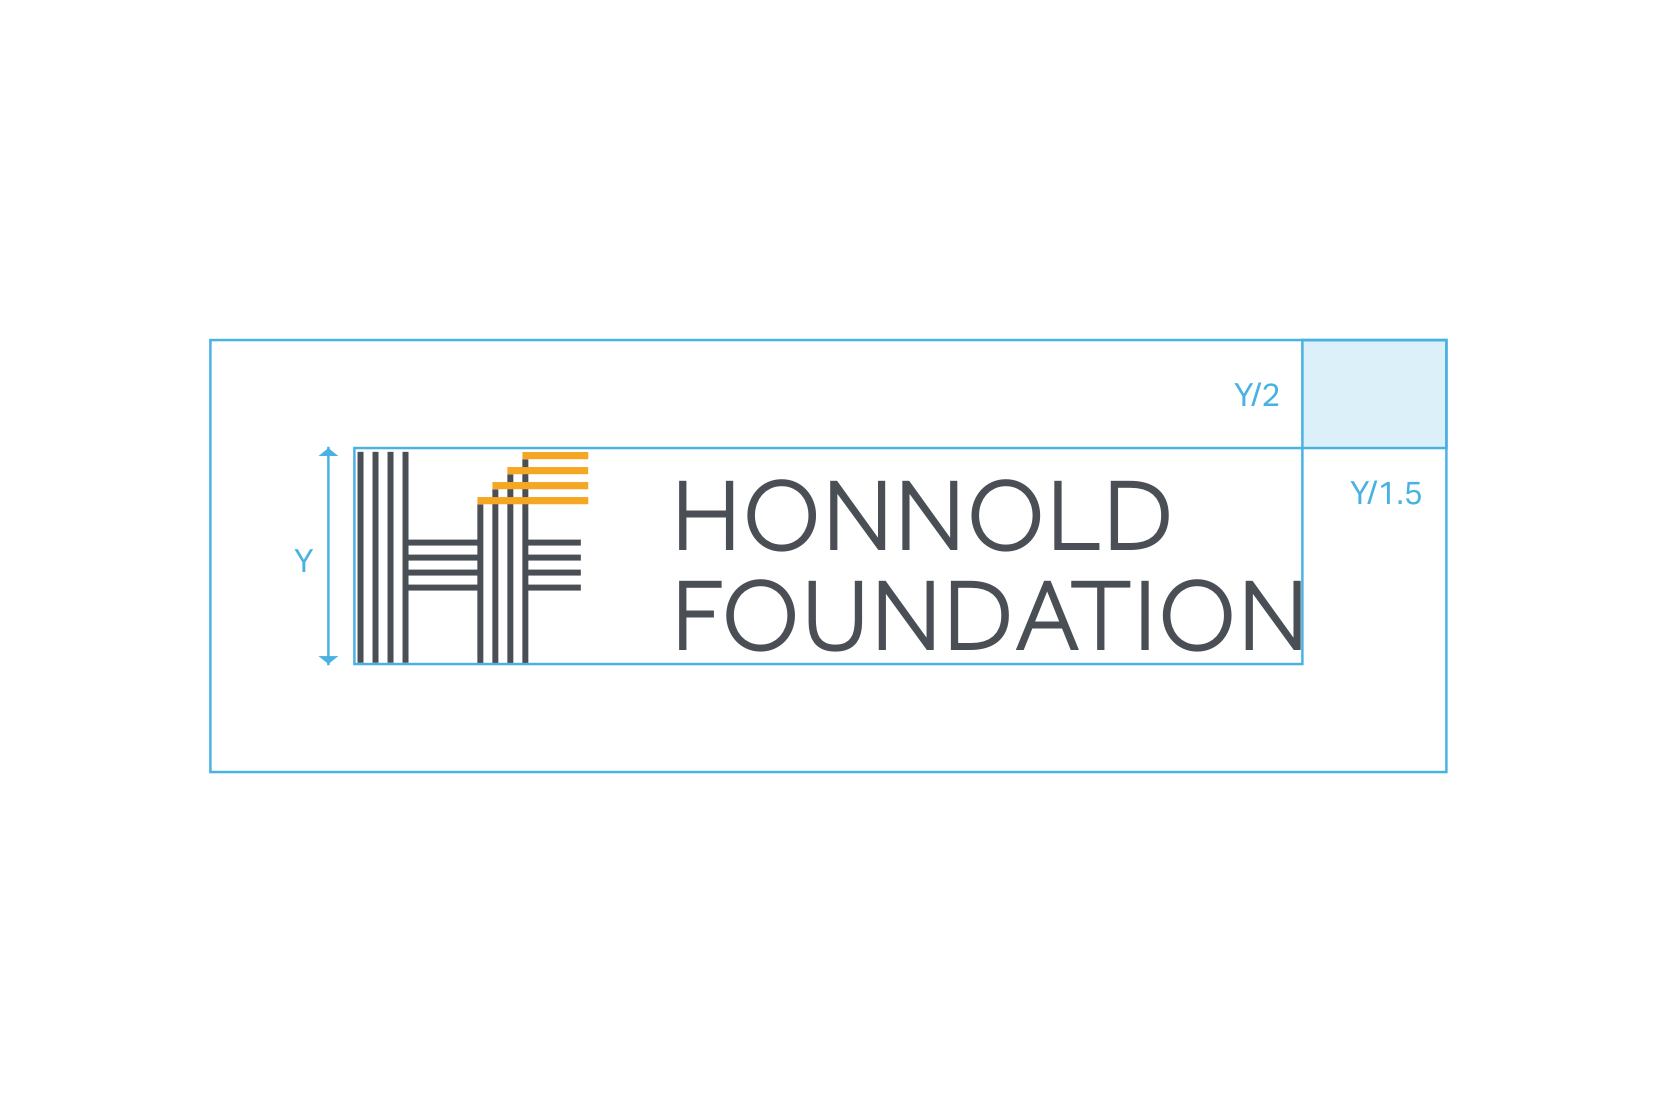 Honnold Foundation Copy 2.jpg